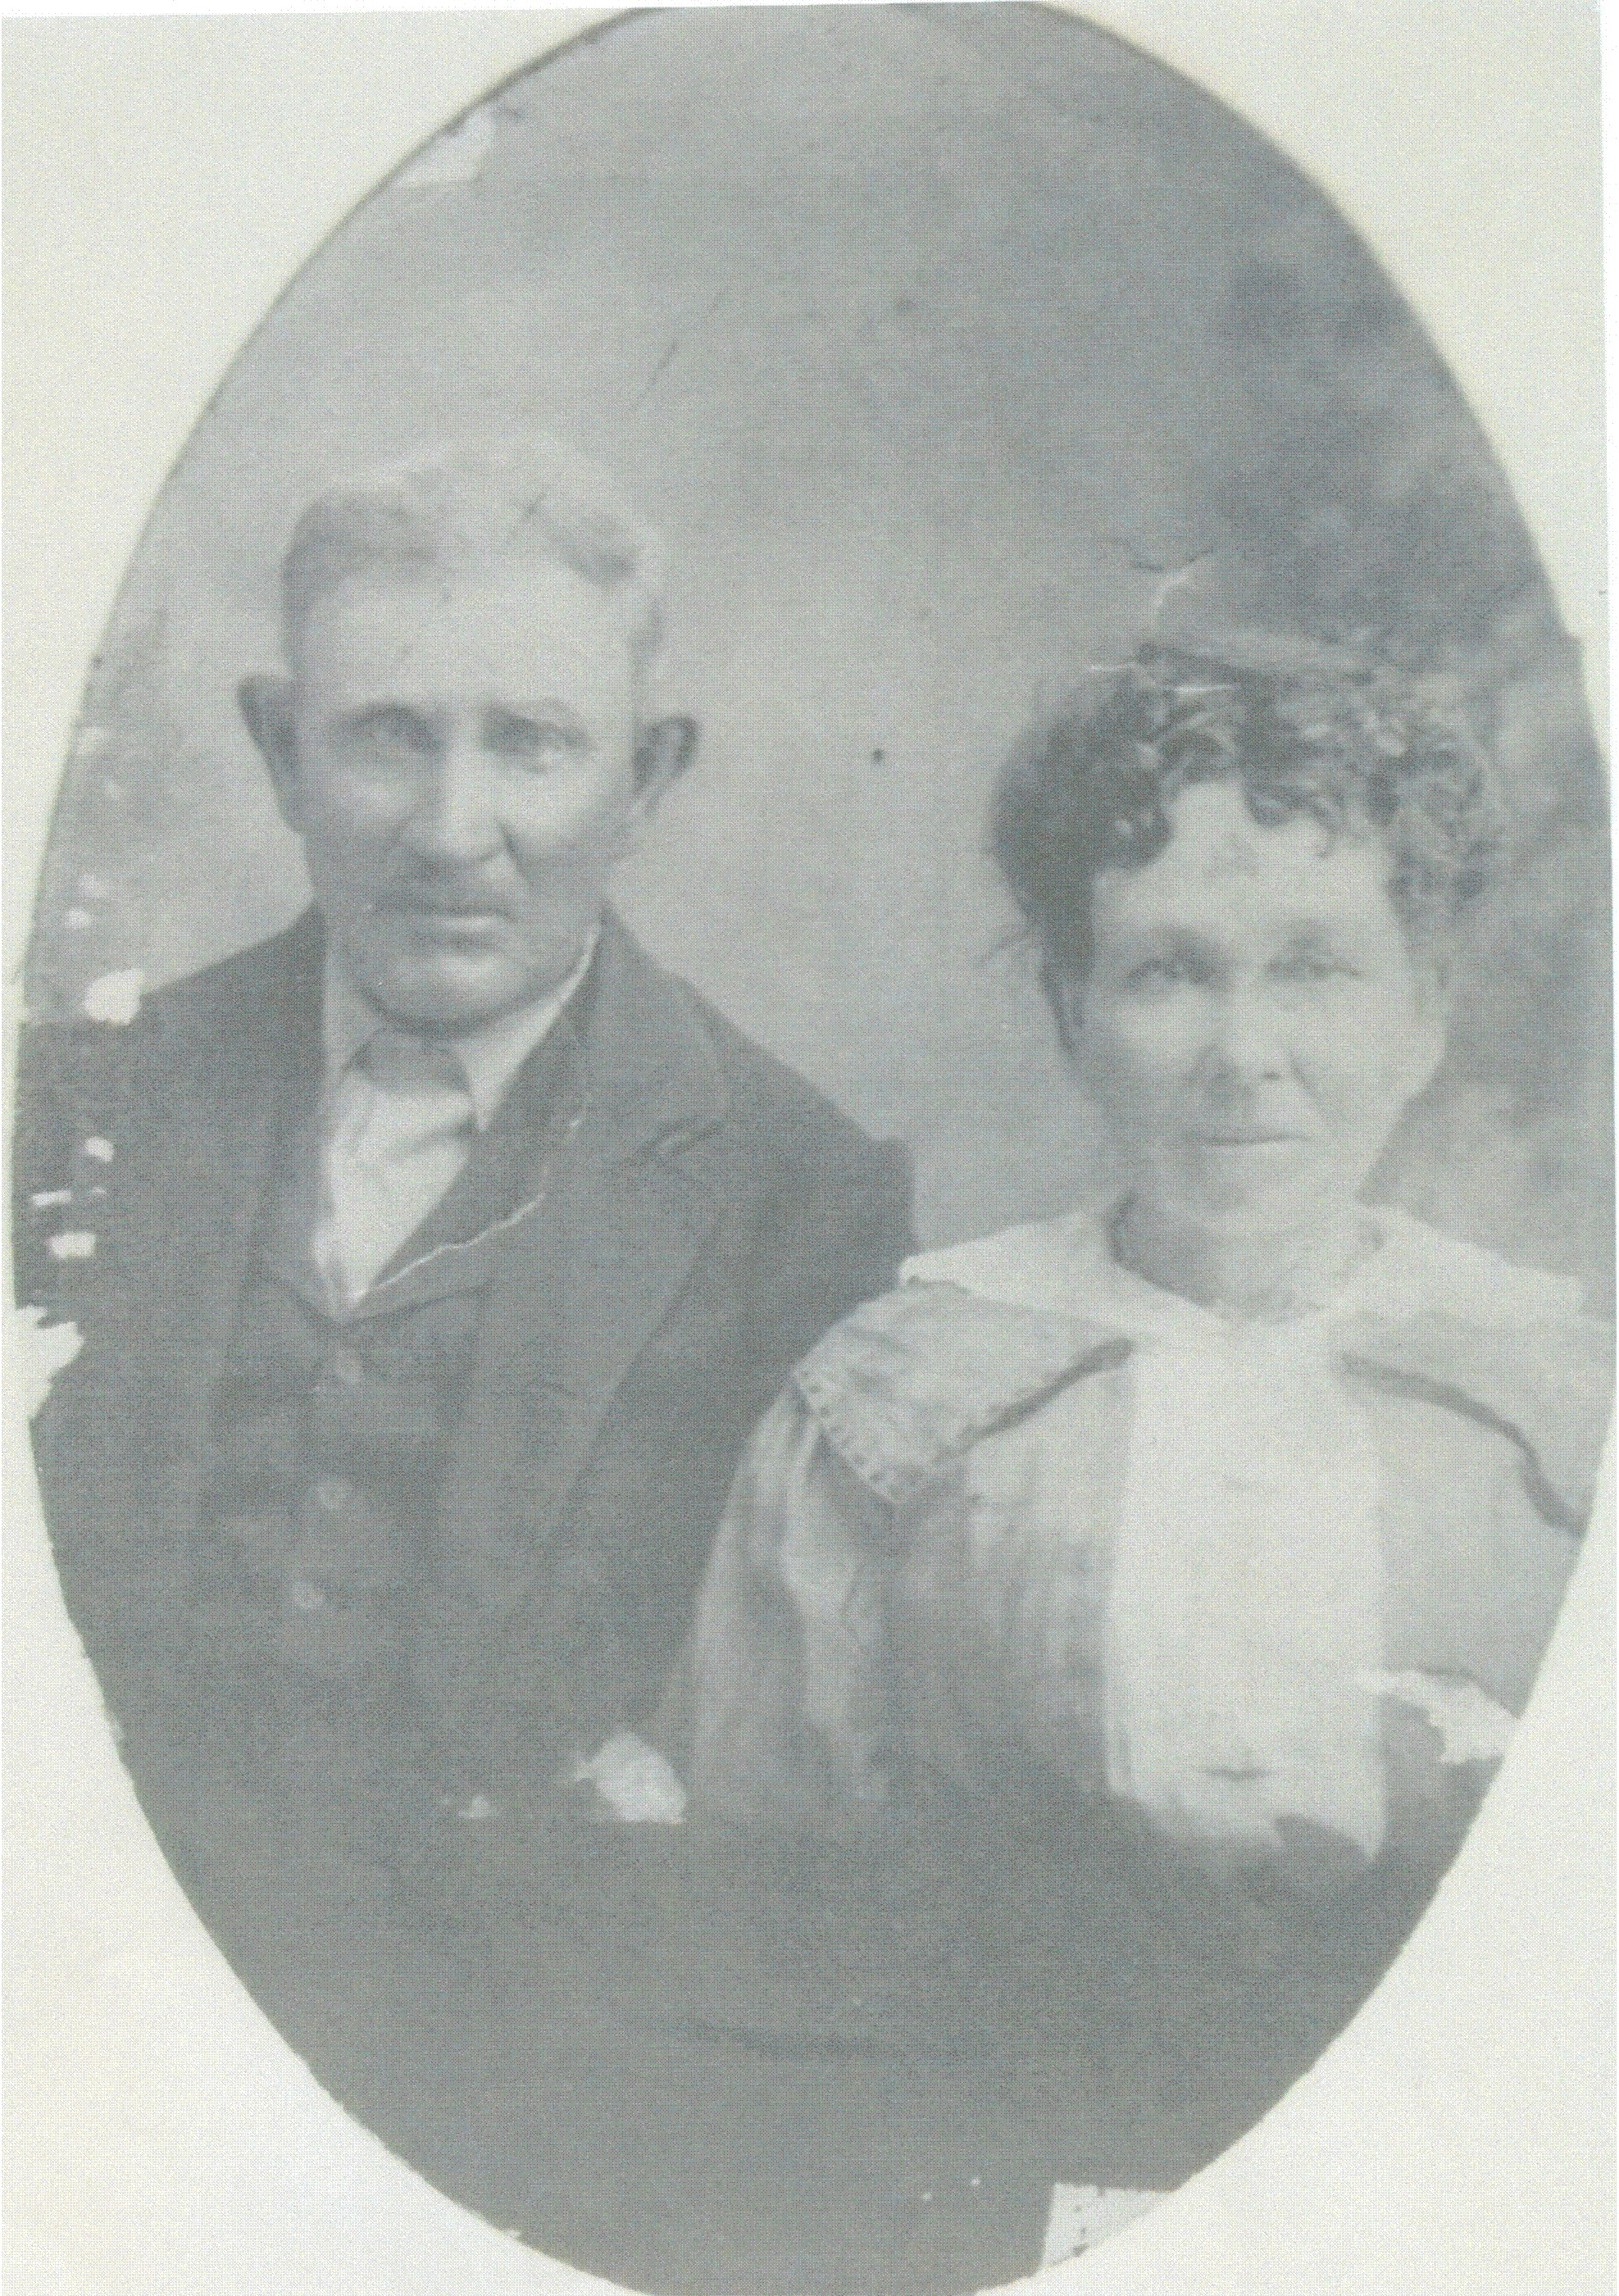 Violet McGhee